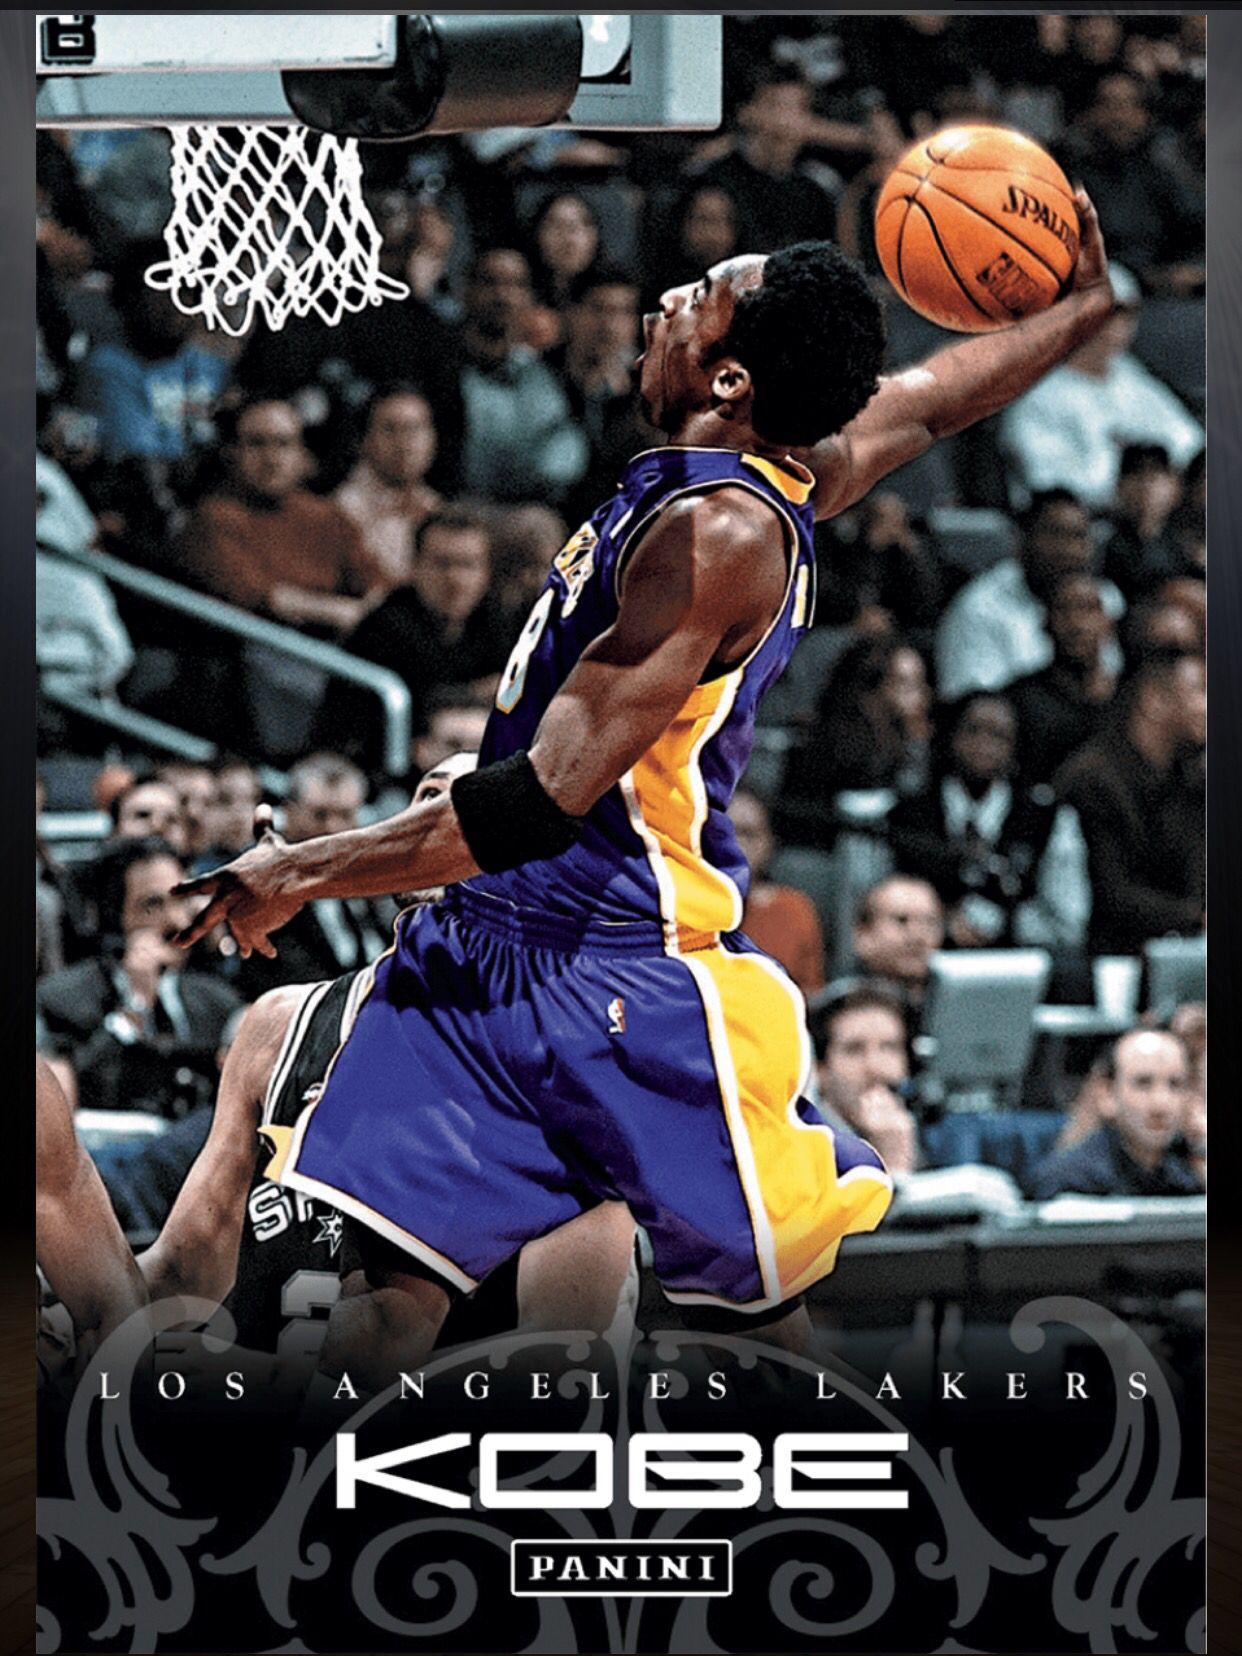 Kobe Bryant Los Angeles Lakers 43 Kobe Anthology Card 2015 2016 Panini Dunk Kobe Bryant Basketball Cards Kobe